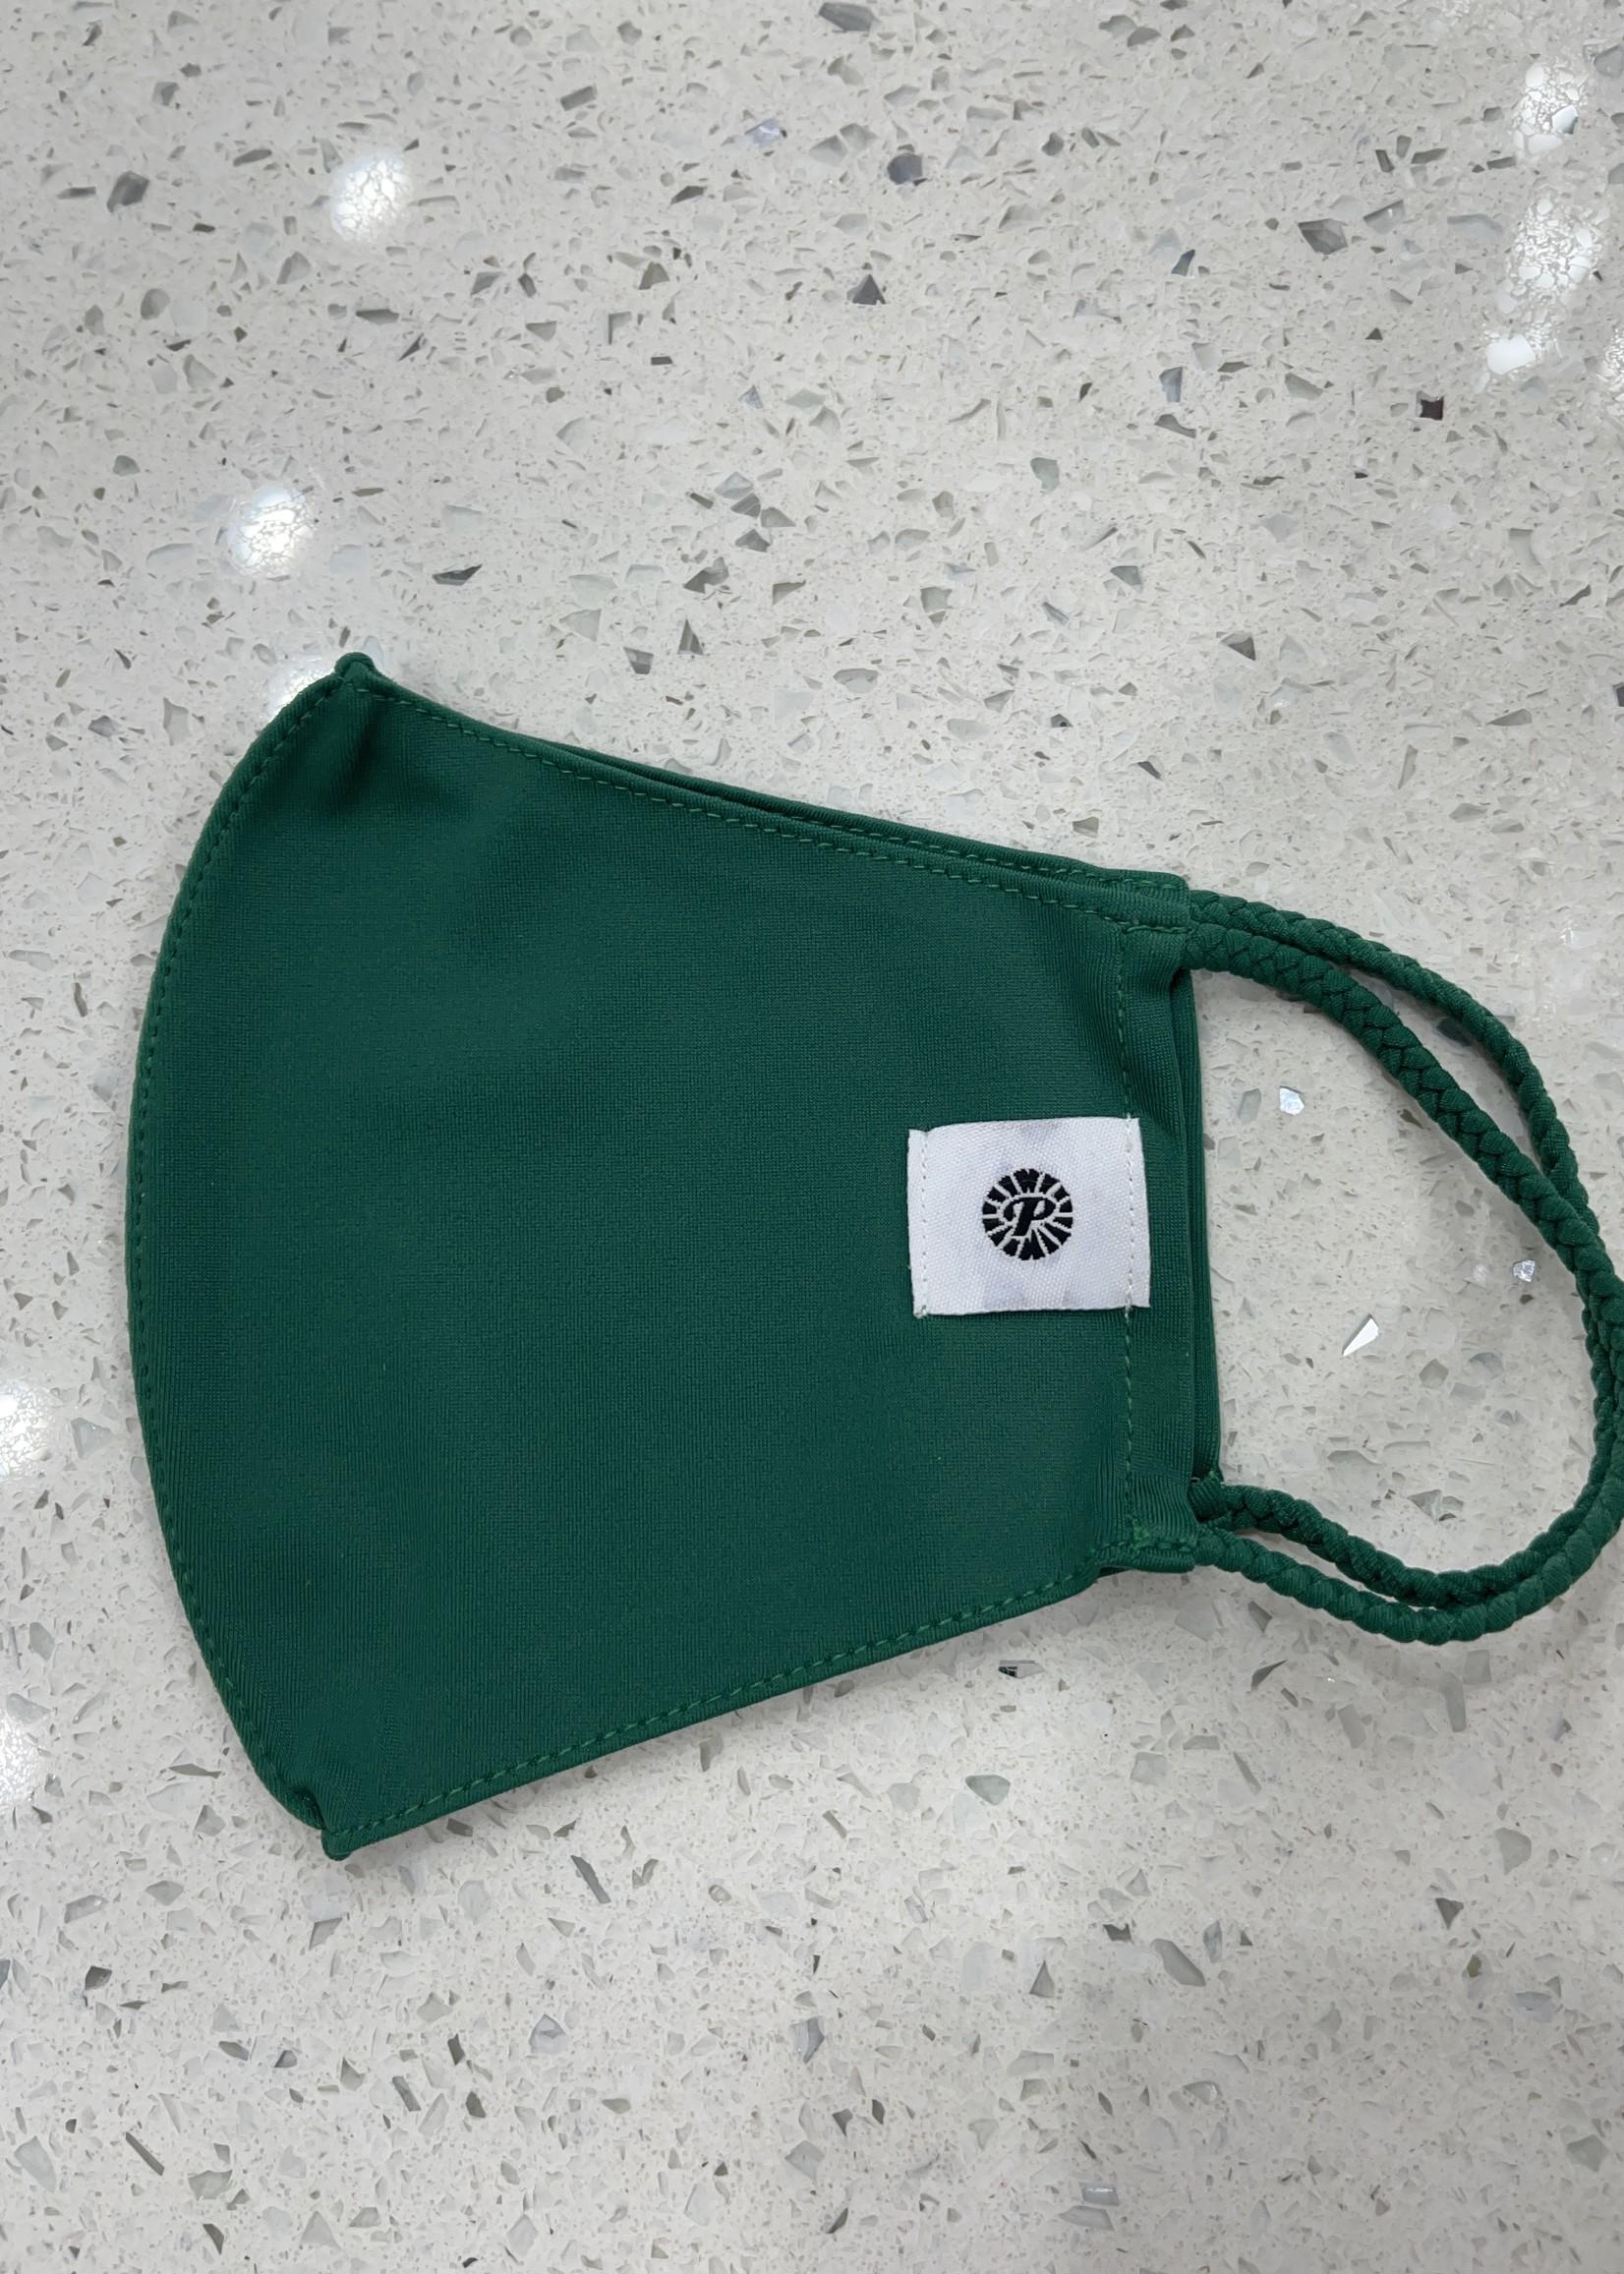 Pomchies Solid Bottle Green Pom Mask